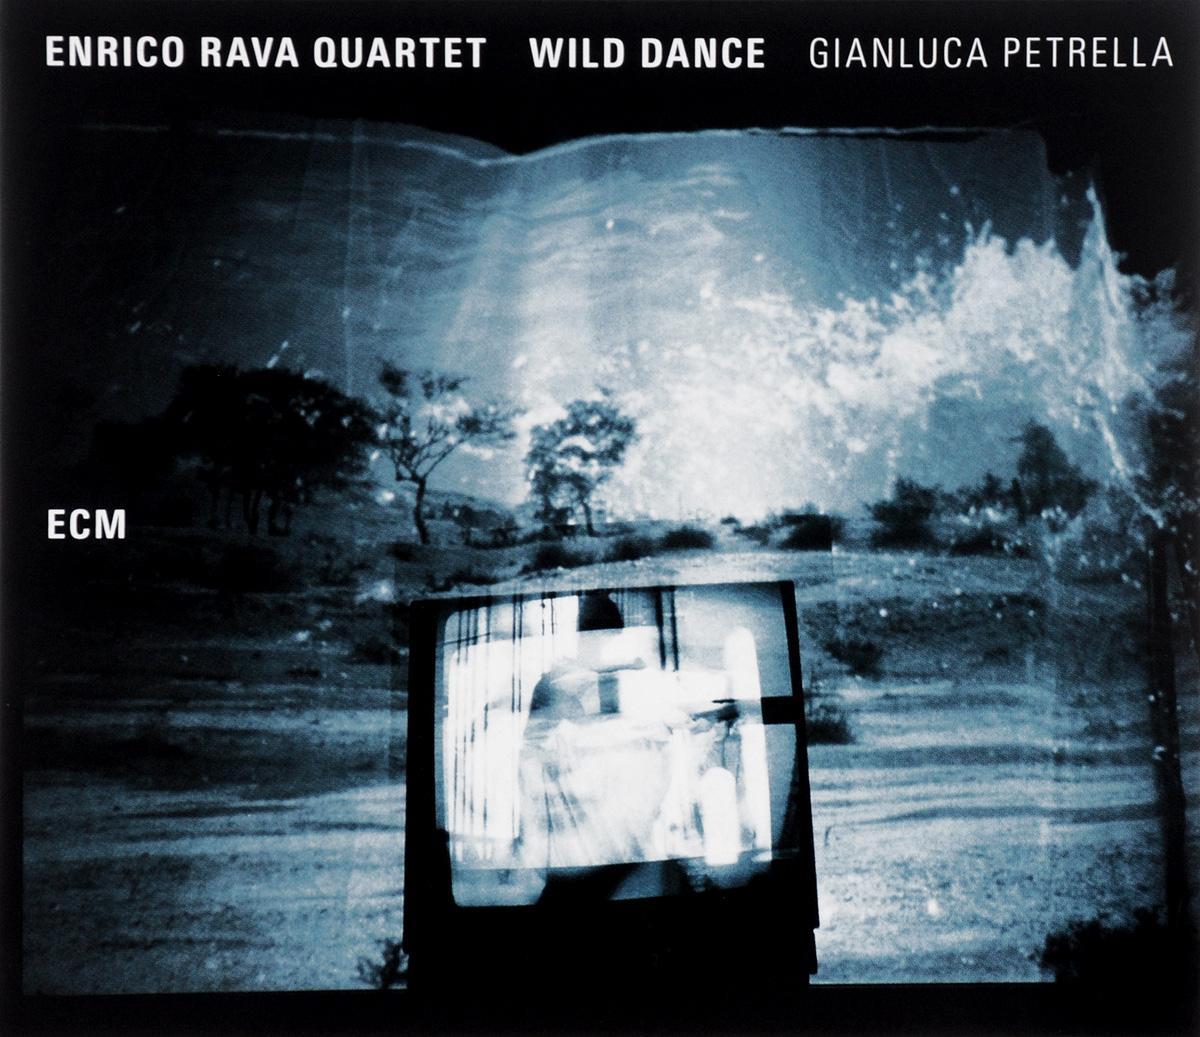 Жанлюка Петрелла,Enrico Rava Quartet Enrico Quartet, Gianluca Petrella. Wild Dance